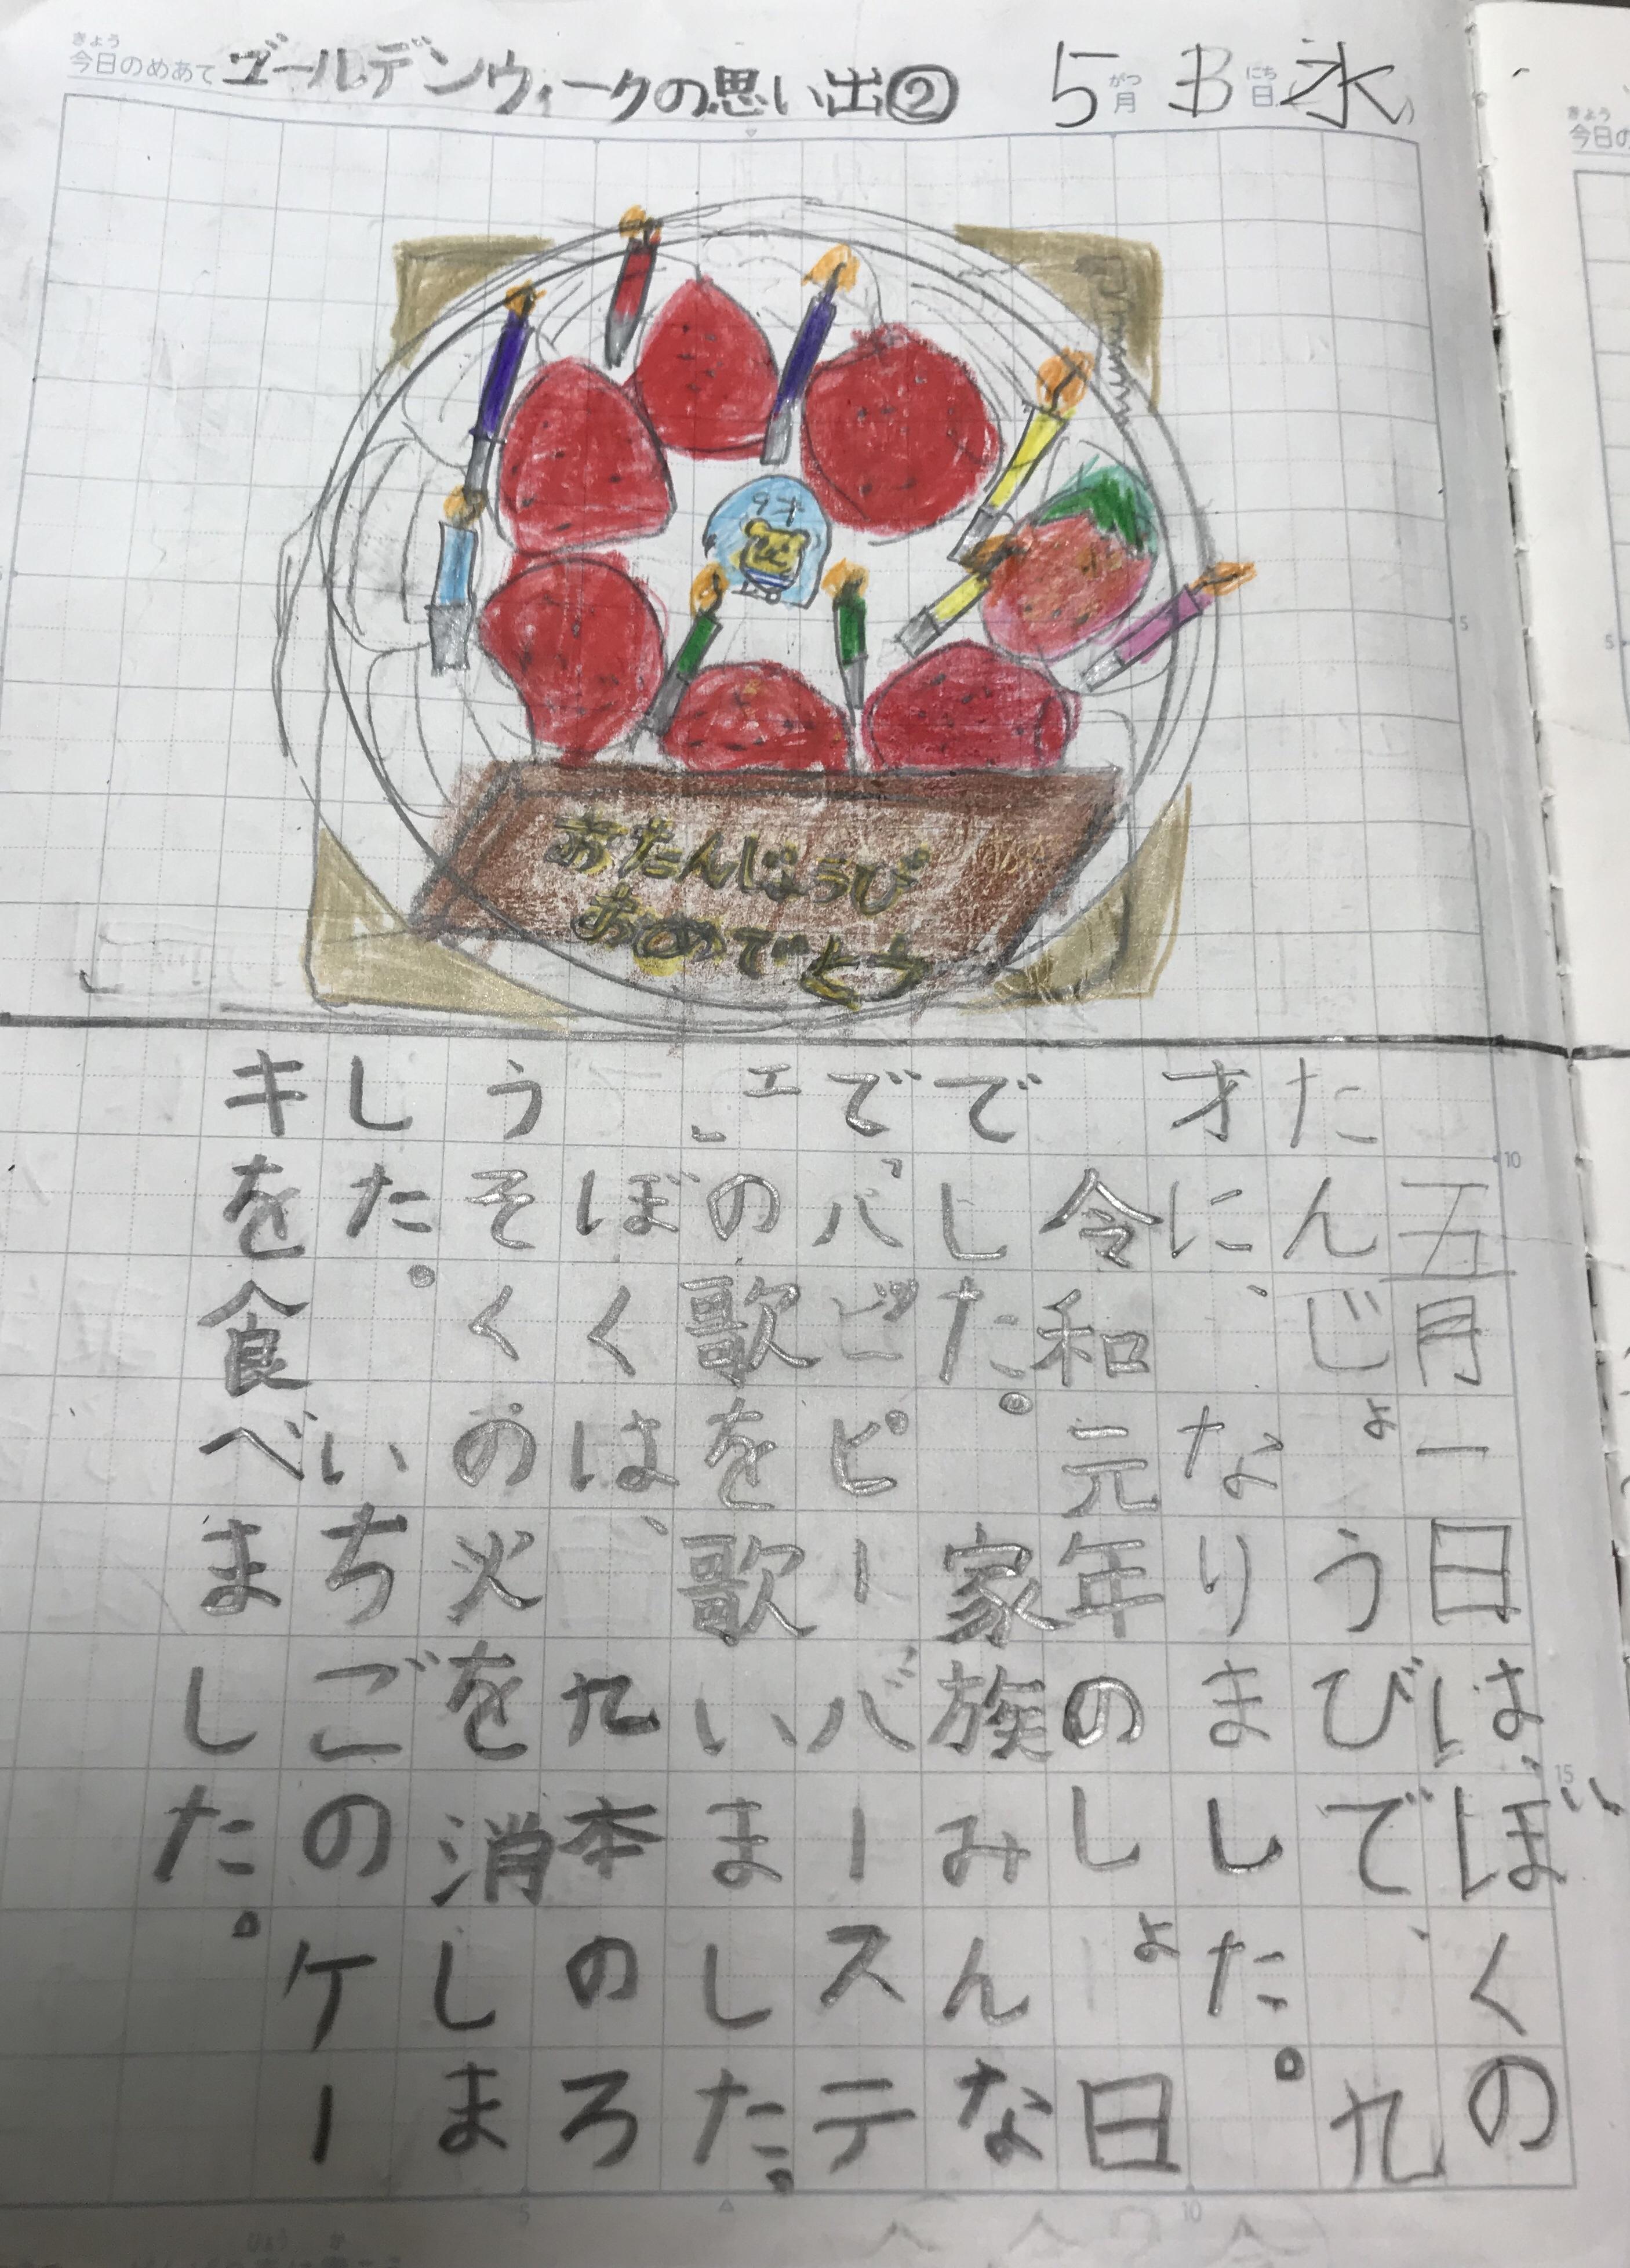 誕生日ケーキ 自主学習 絵日記